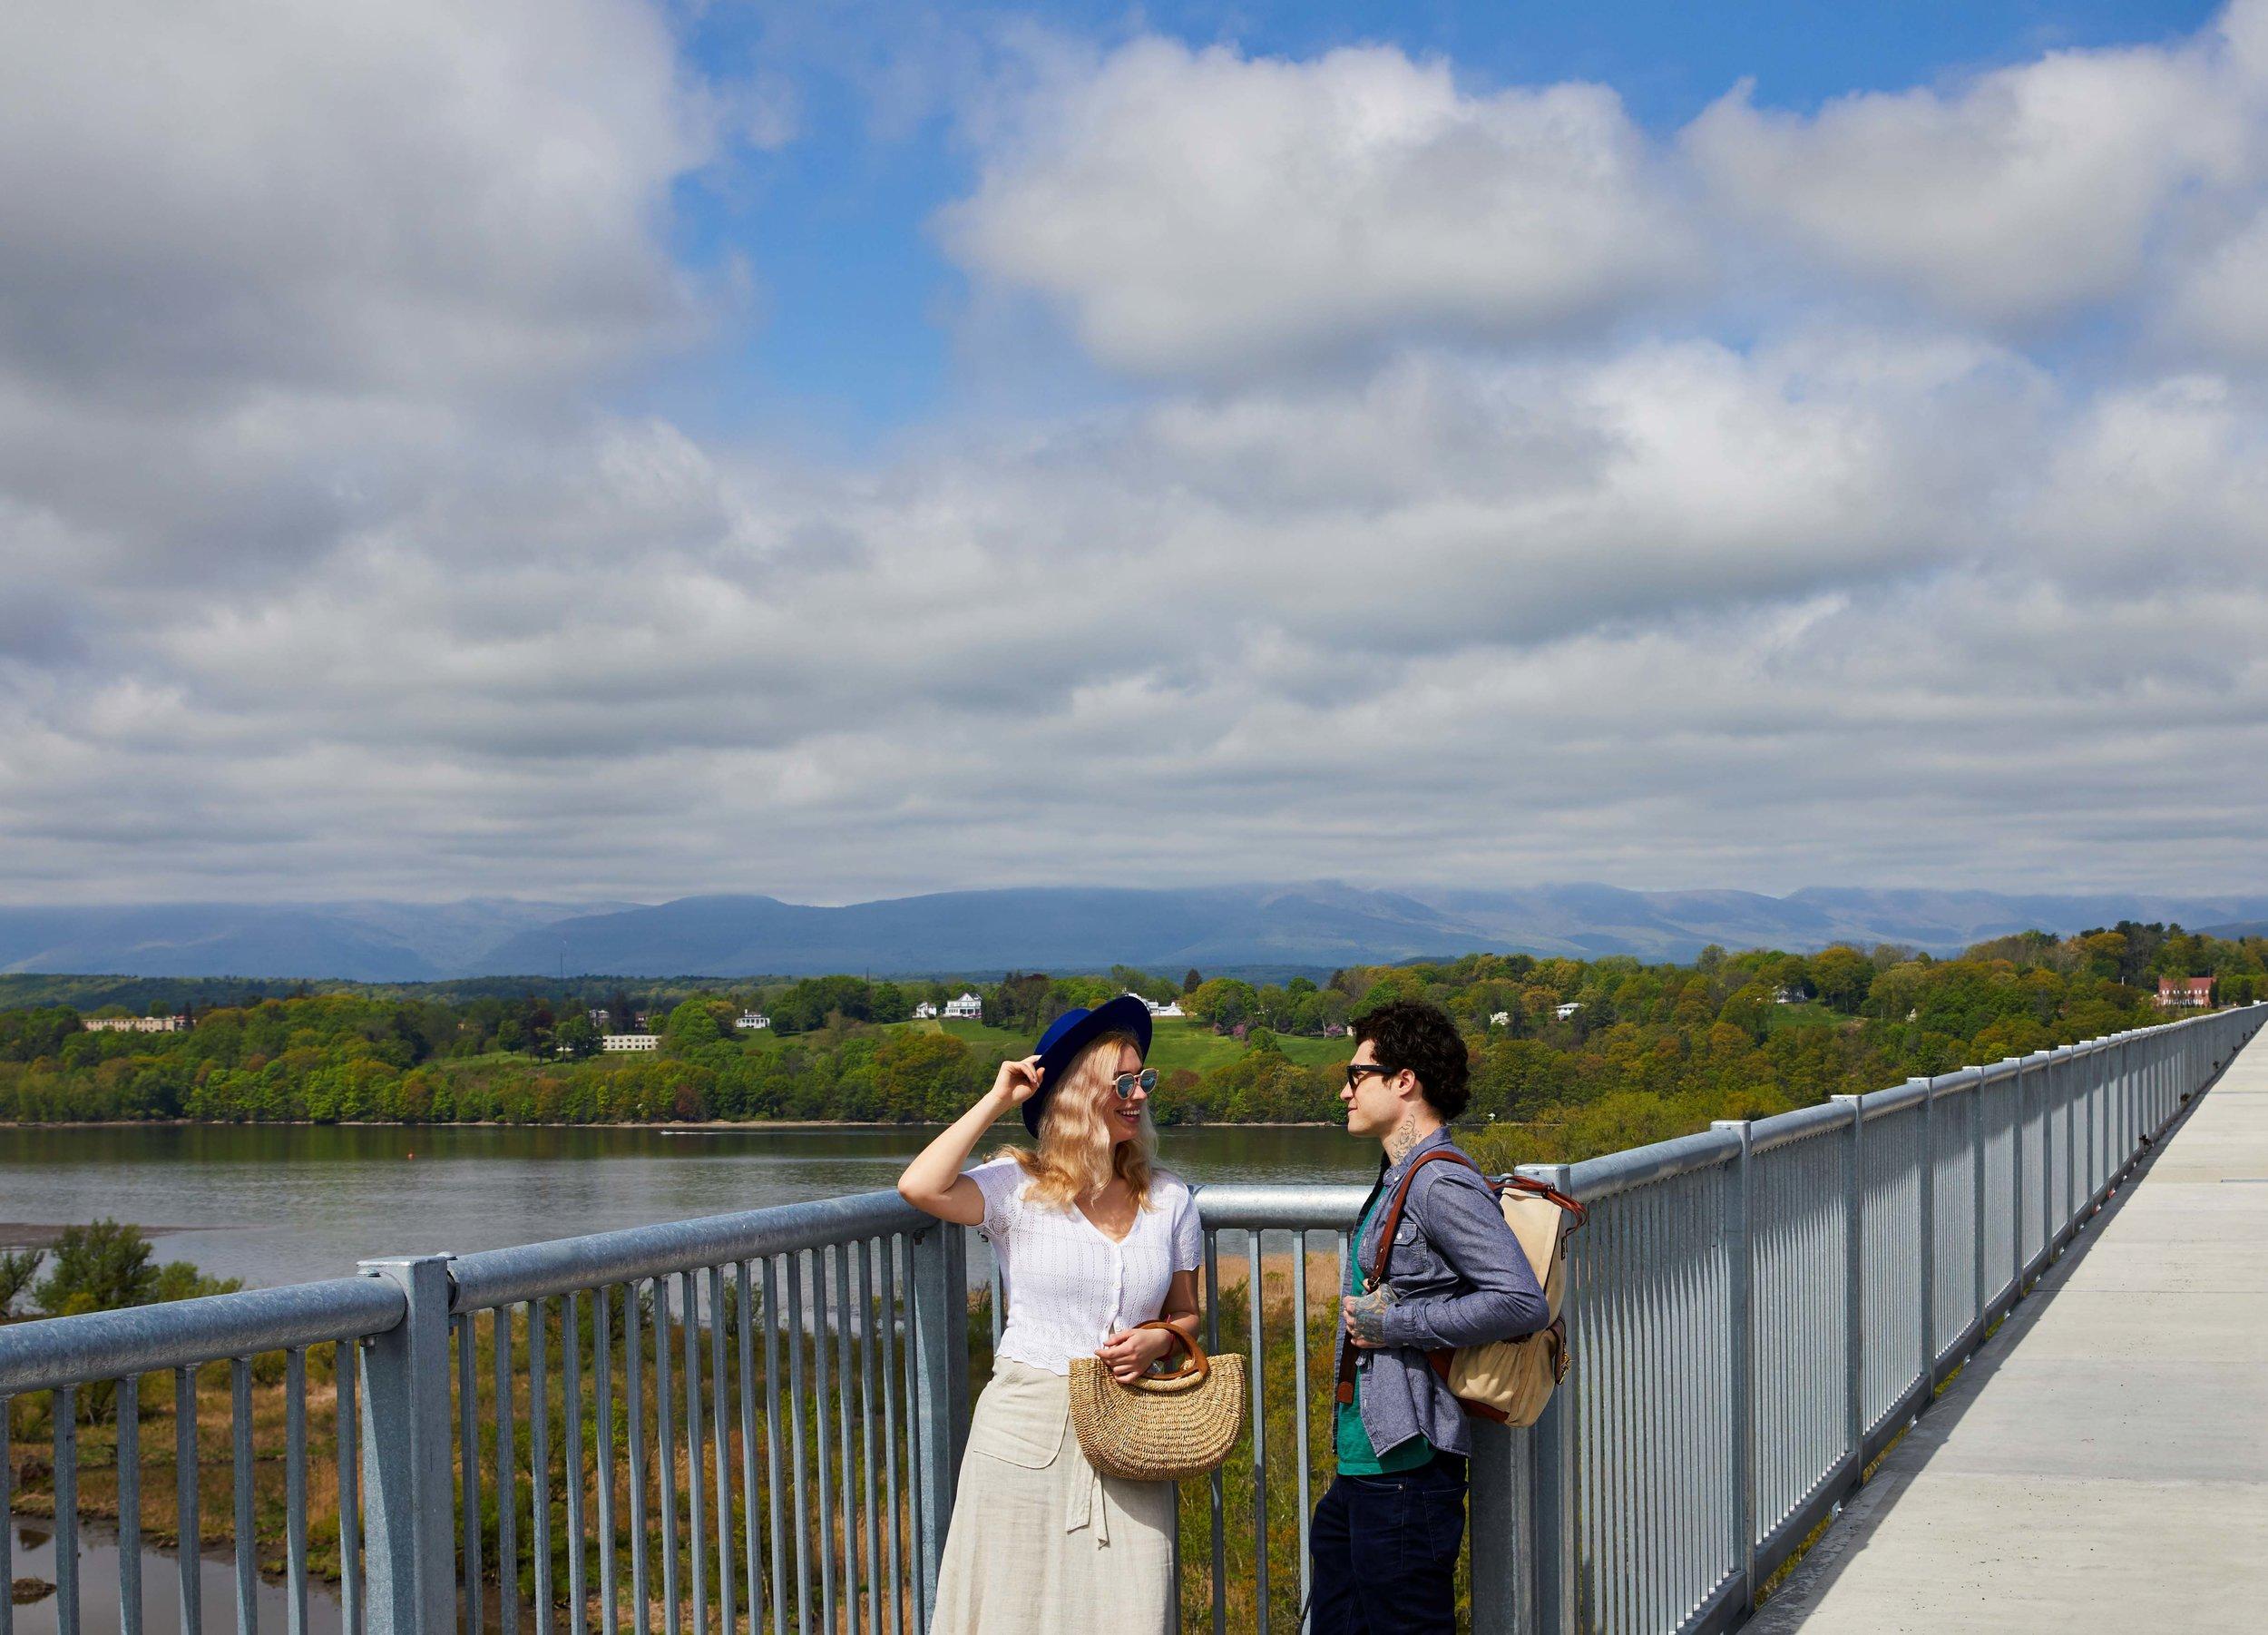 Hudson River Skywalk at the Rip Van Winkle Bridge